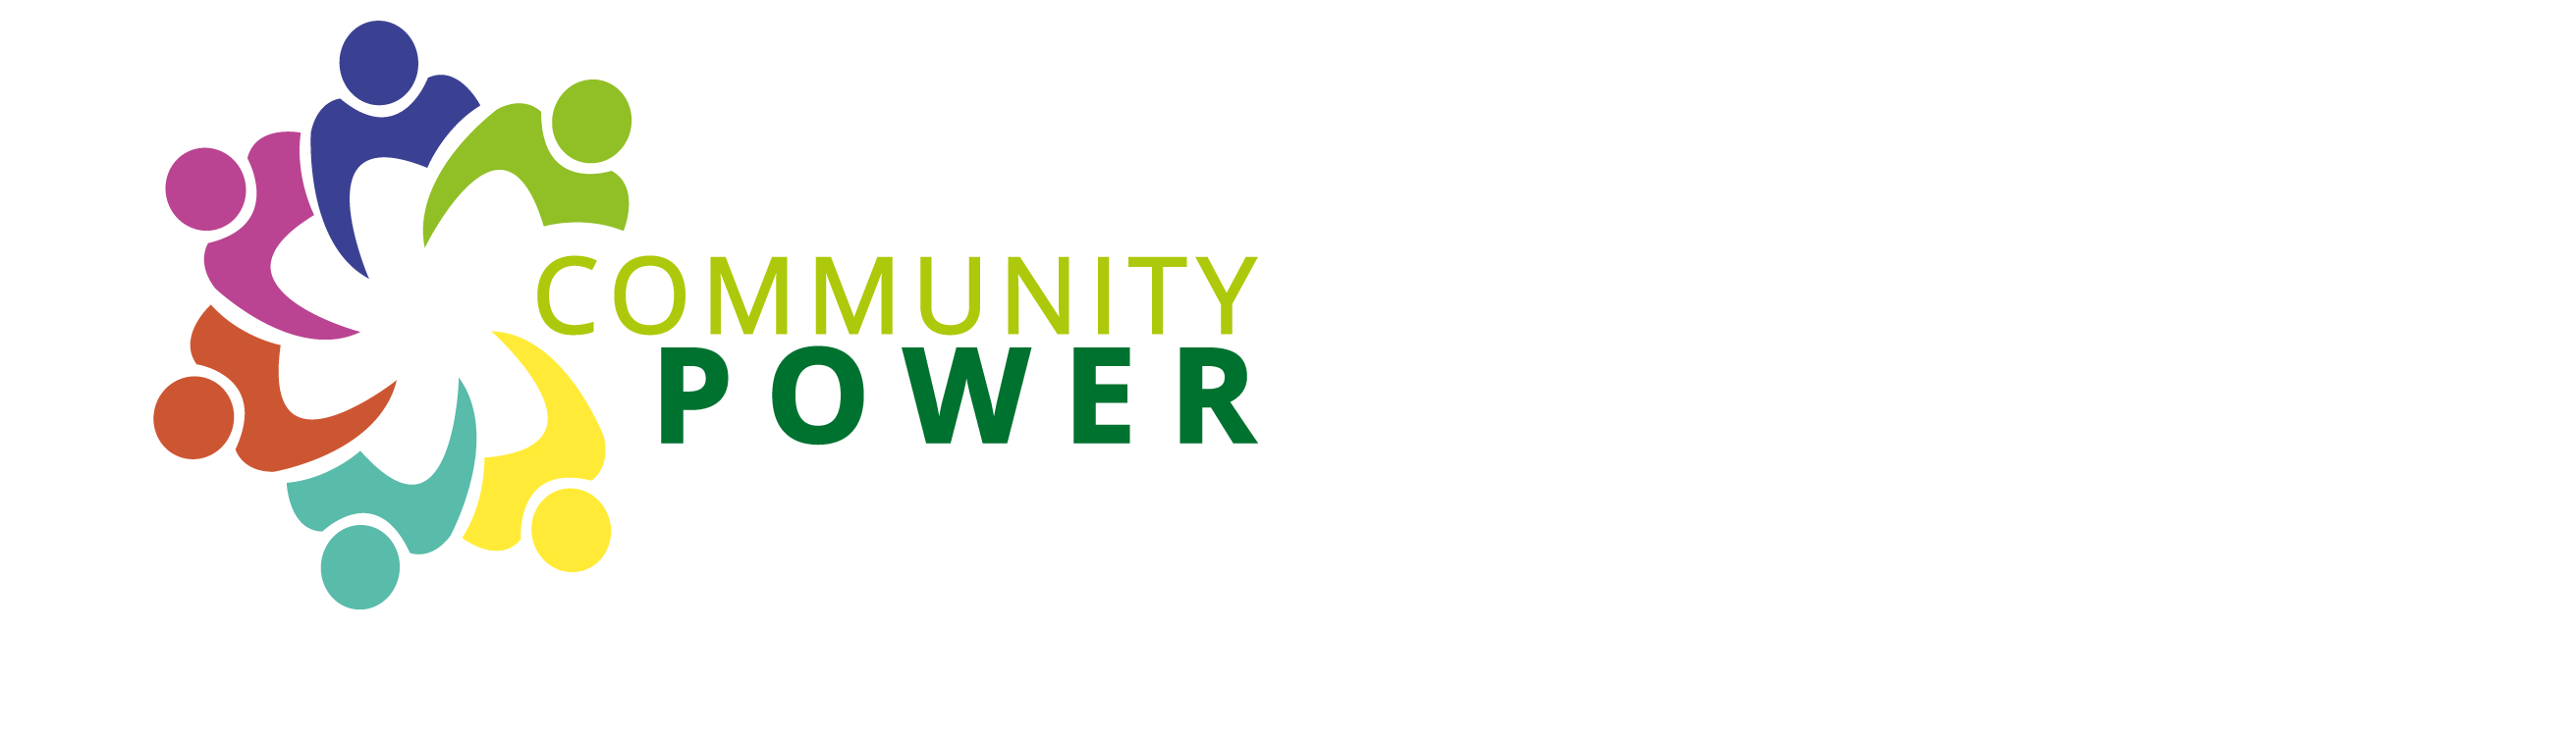 The European Community Power Coalition